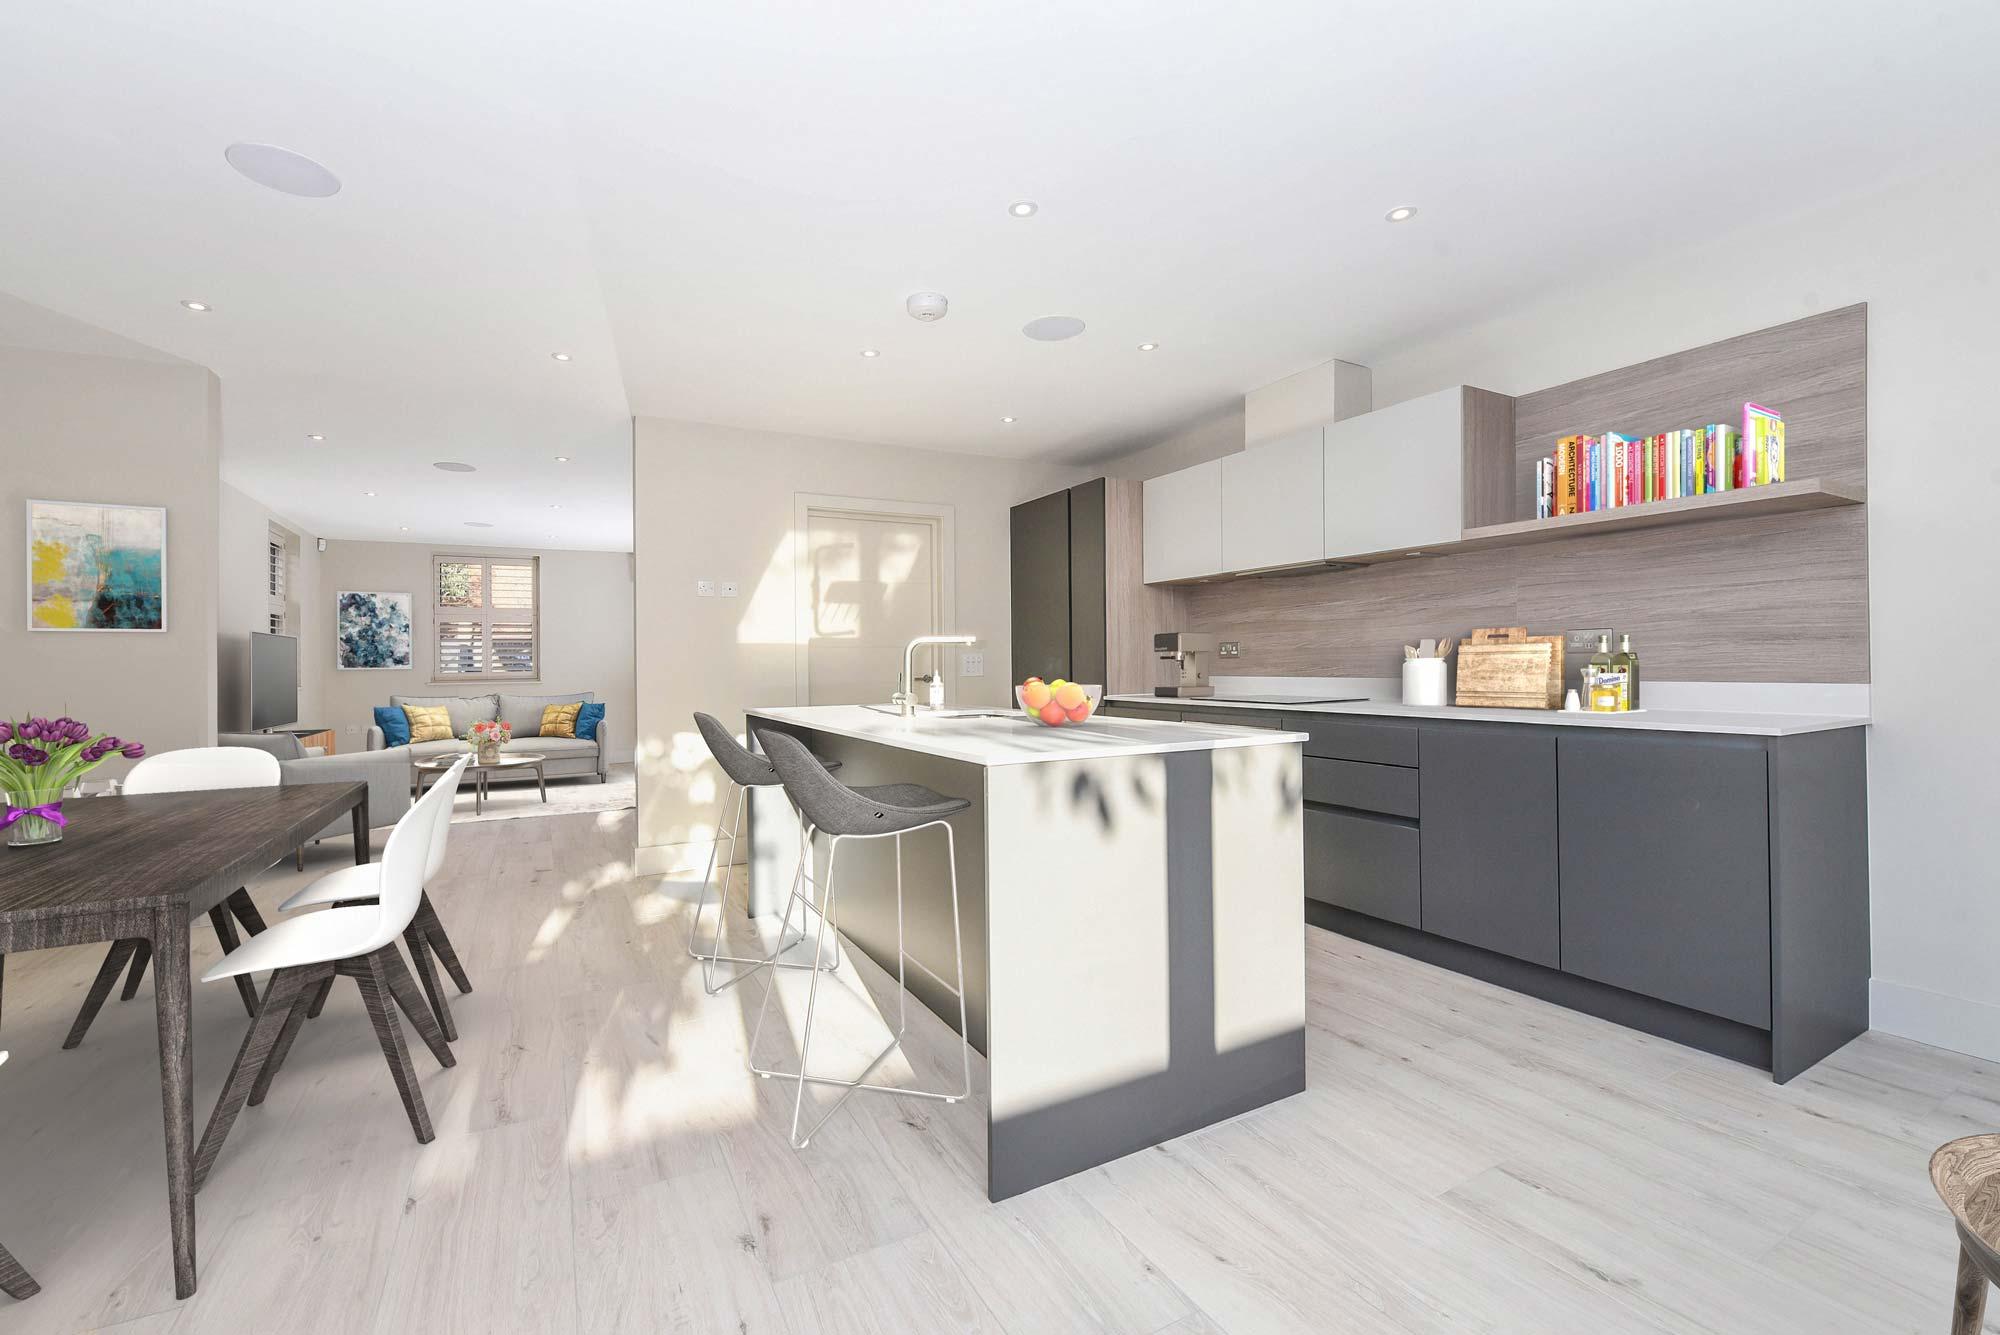 Plot-2-Kitchen-Diner-Sitting-Room